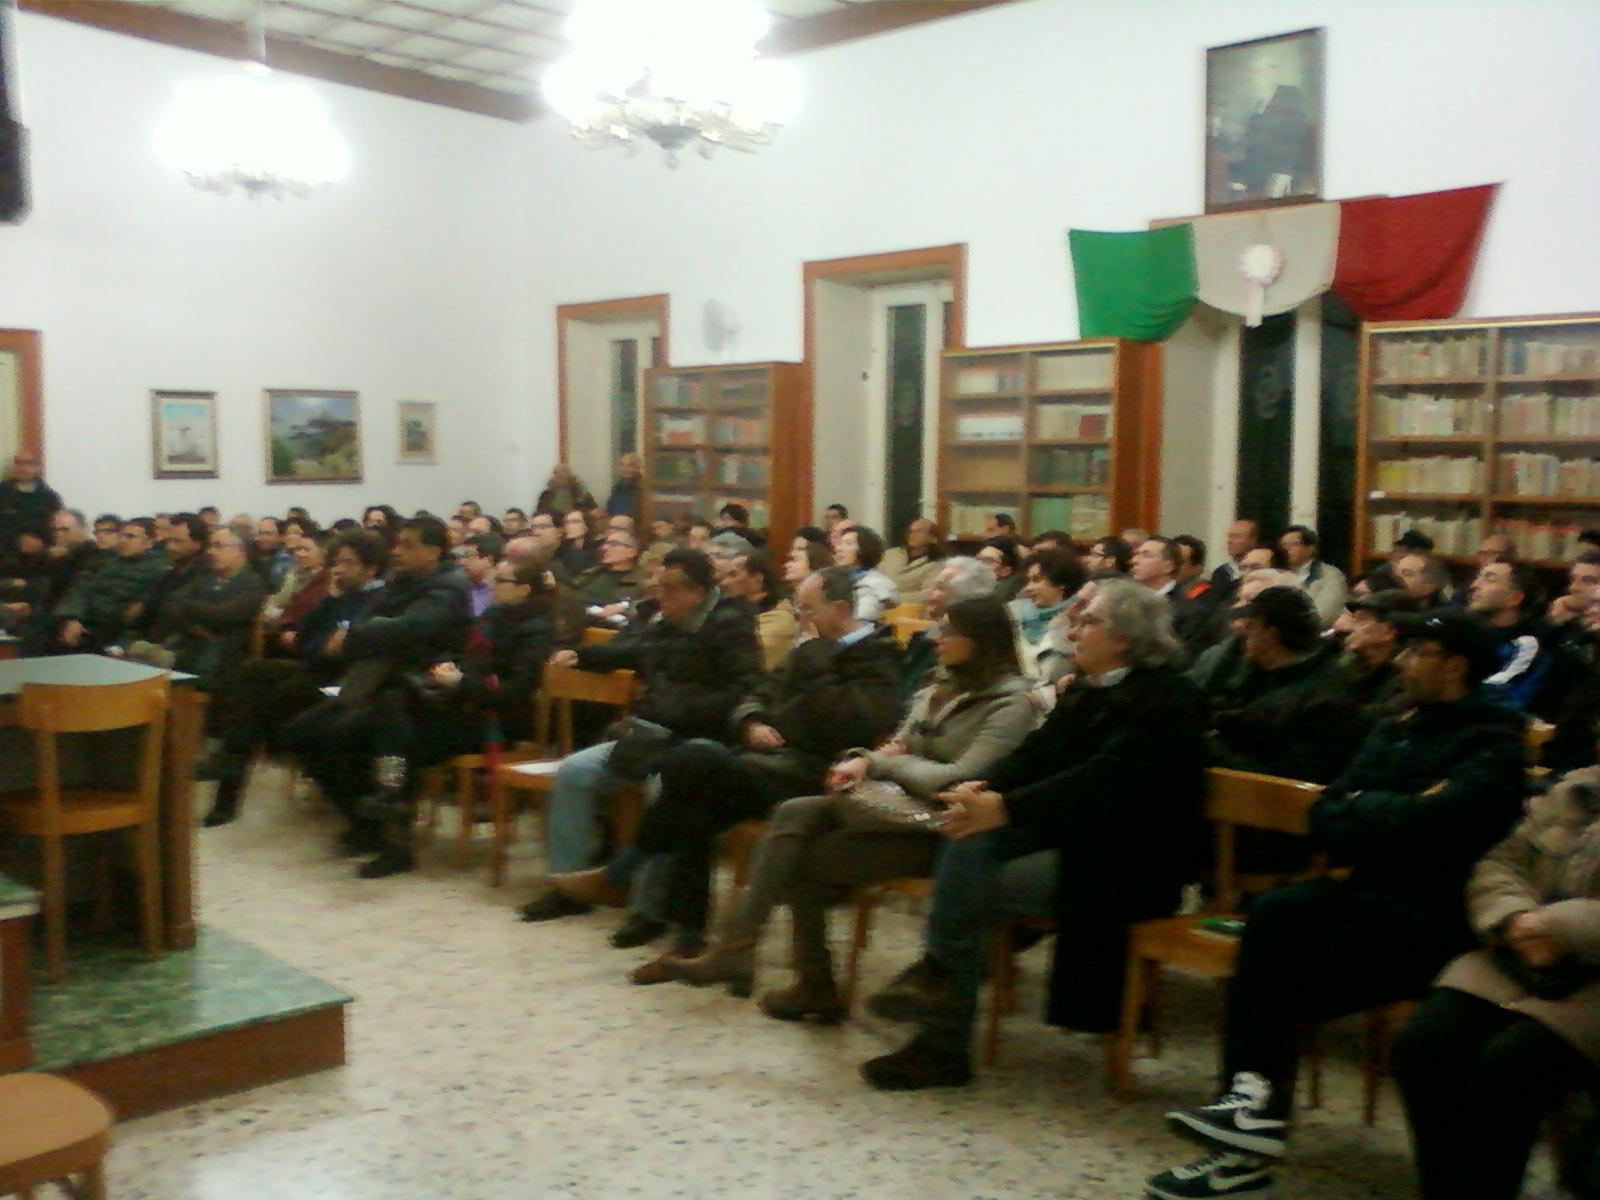 assemblea centro storico